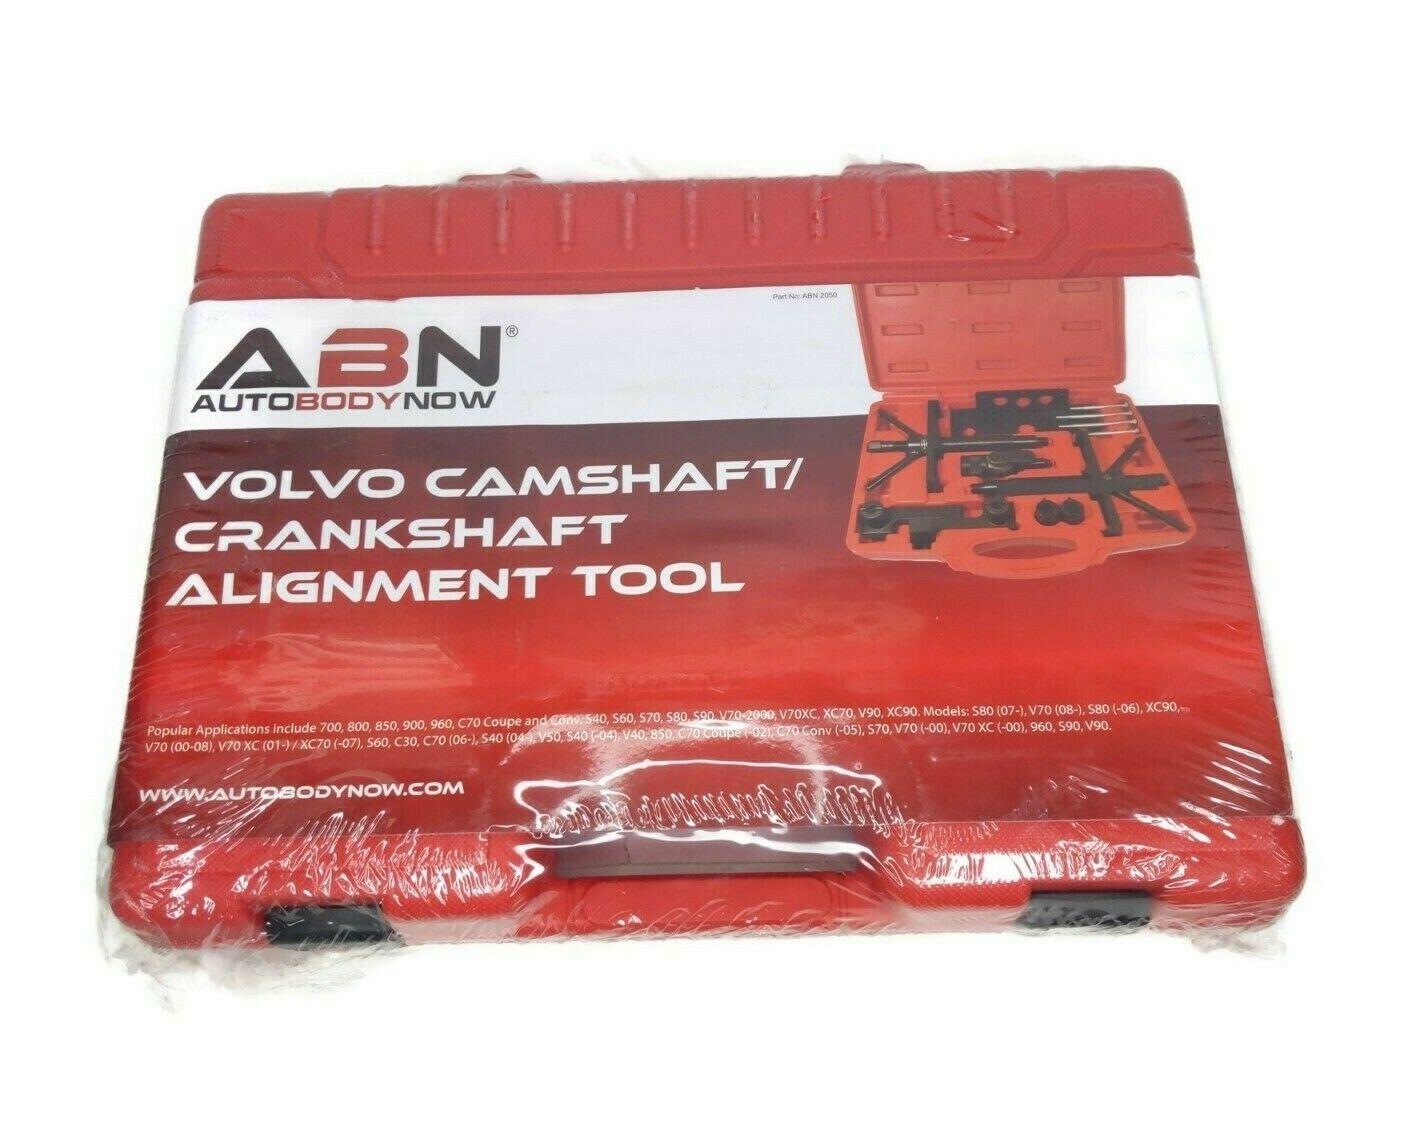 960 S70 S90 ABN Volvo Camshaft Crankshaft Engine Alignment Tool Timing Set Kit for Volvo 850 S40